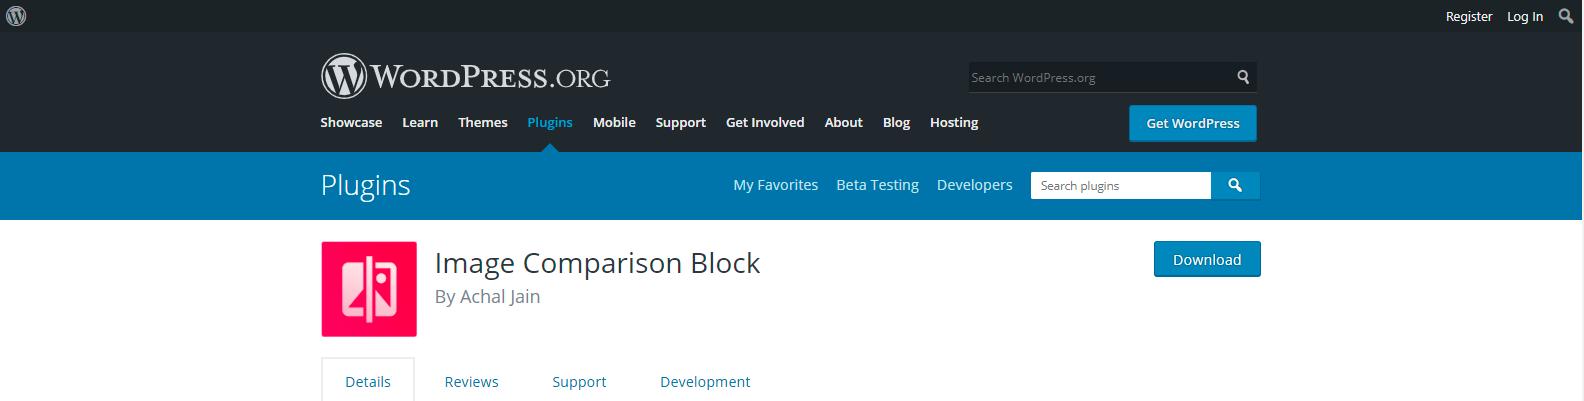 Image Comparison Block